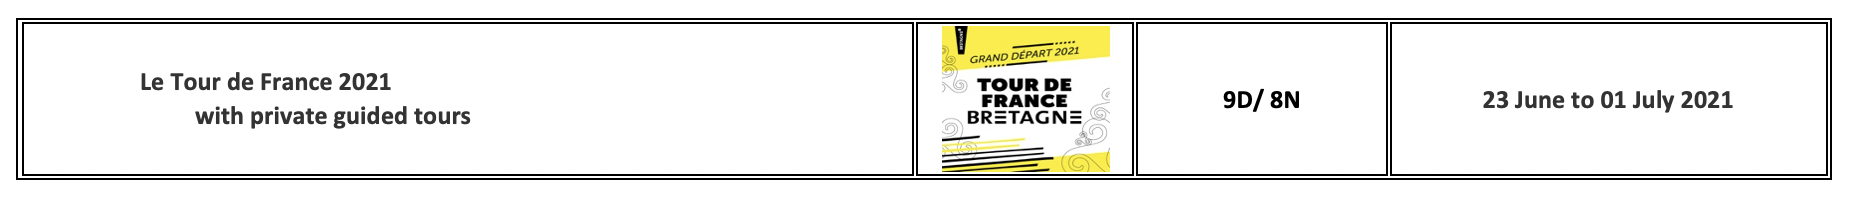 Enjoy France Tours TDF 2021